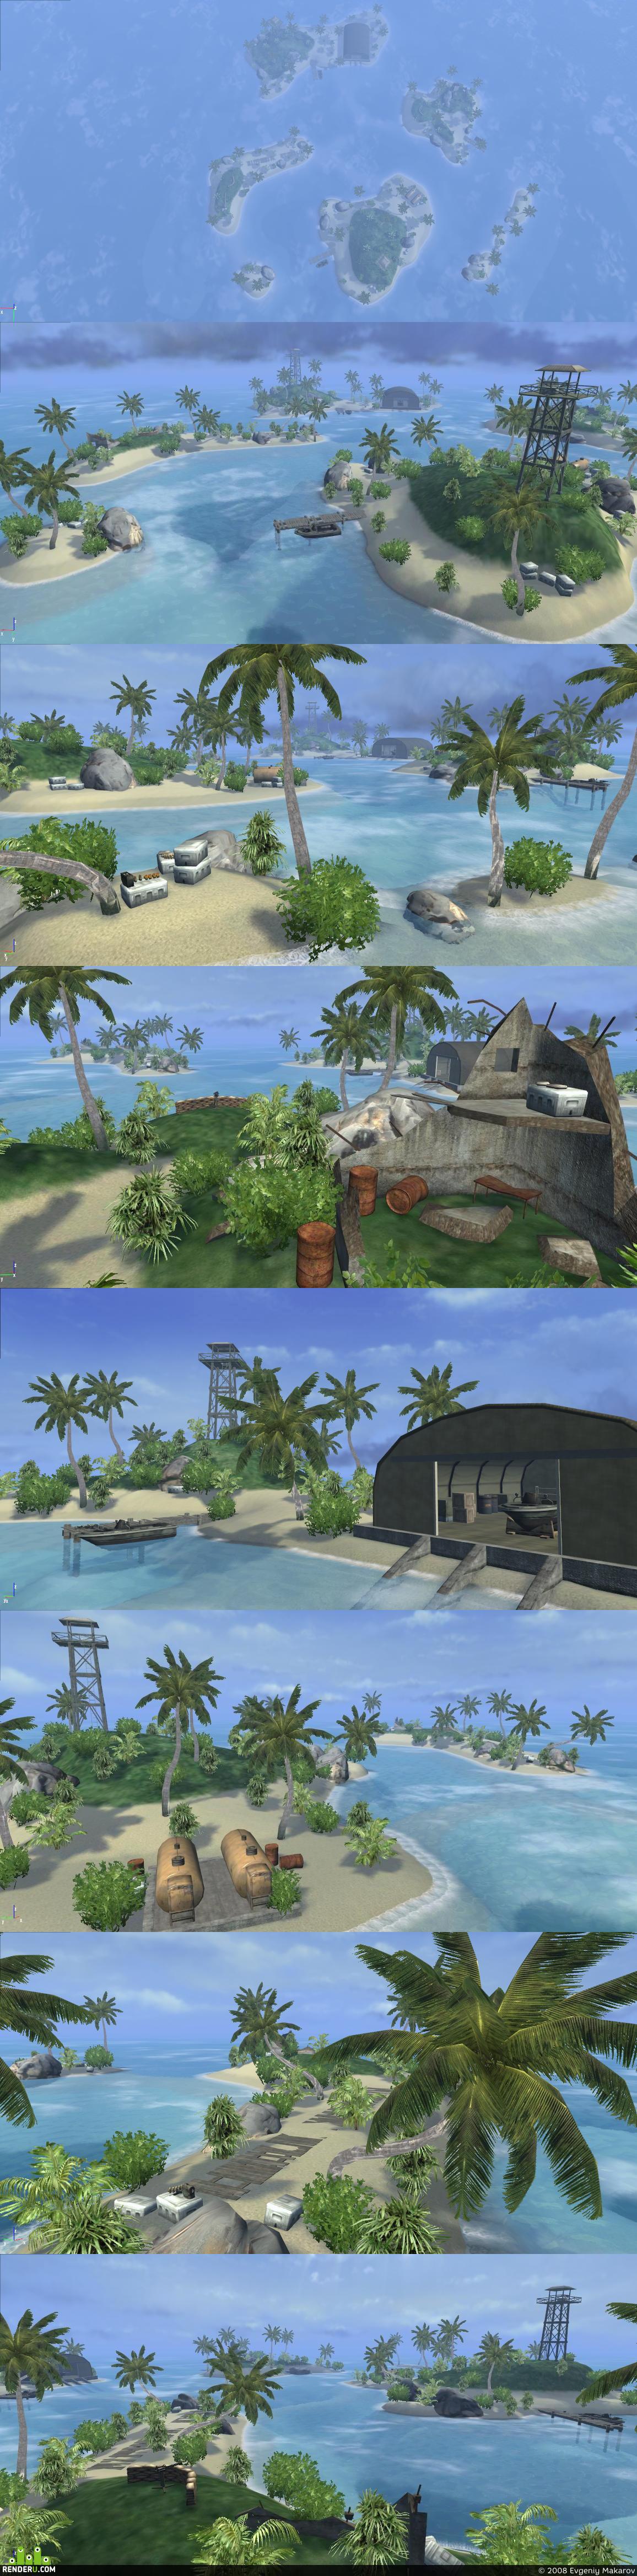 preview FarCry - Лазурь 2008